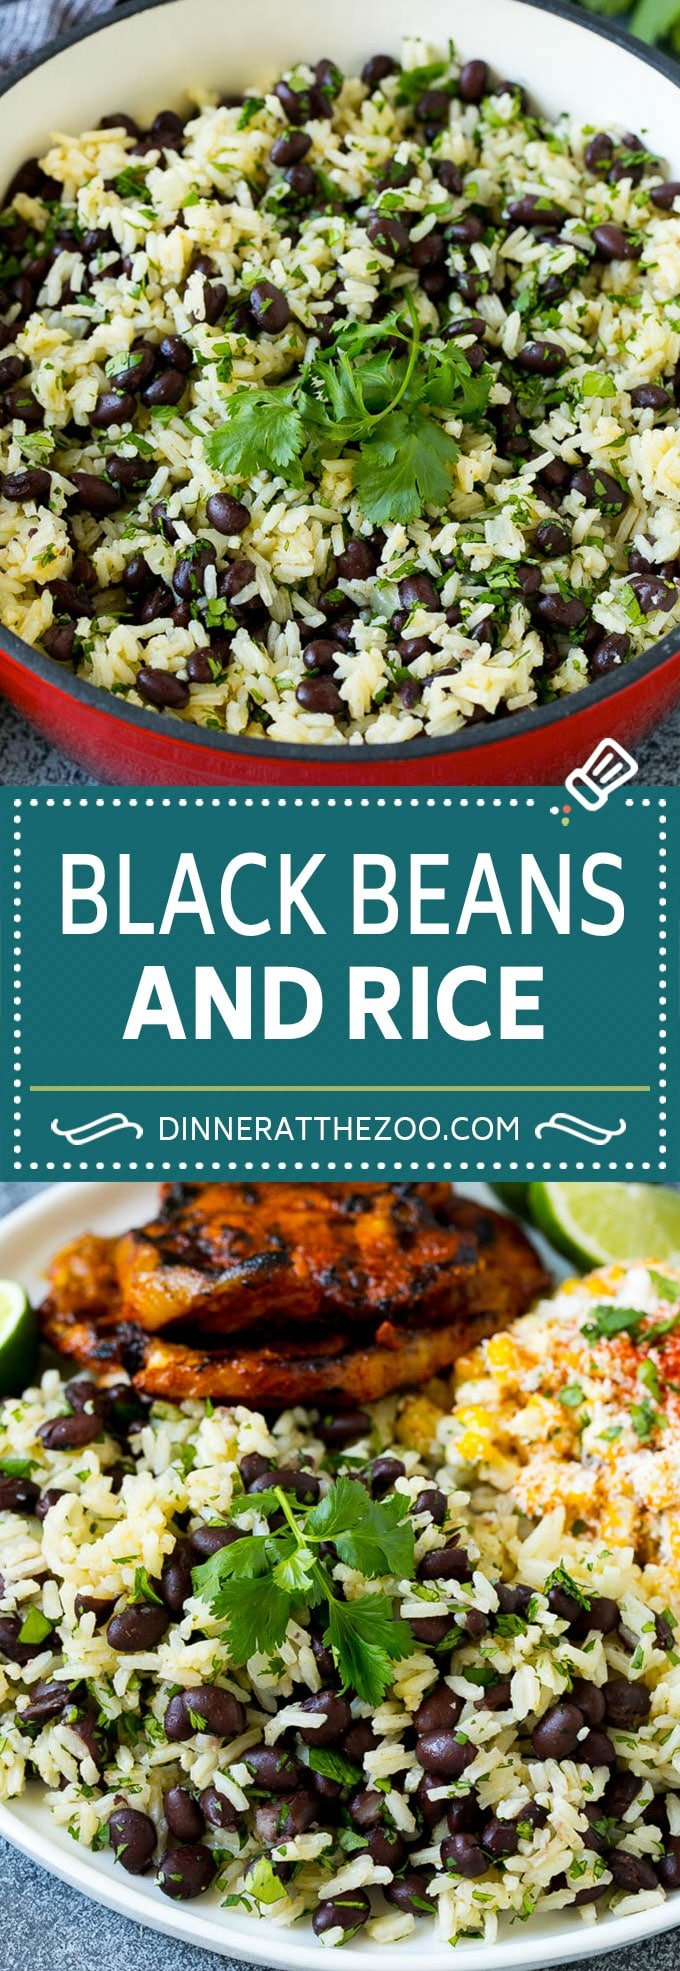 Black Beans and Rice Recipe   Cuban Black Beans   Beans and Rice #beans #rice #blackbeans #sidedish #glutenfree #dinner #dinneratthezoo